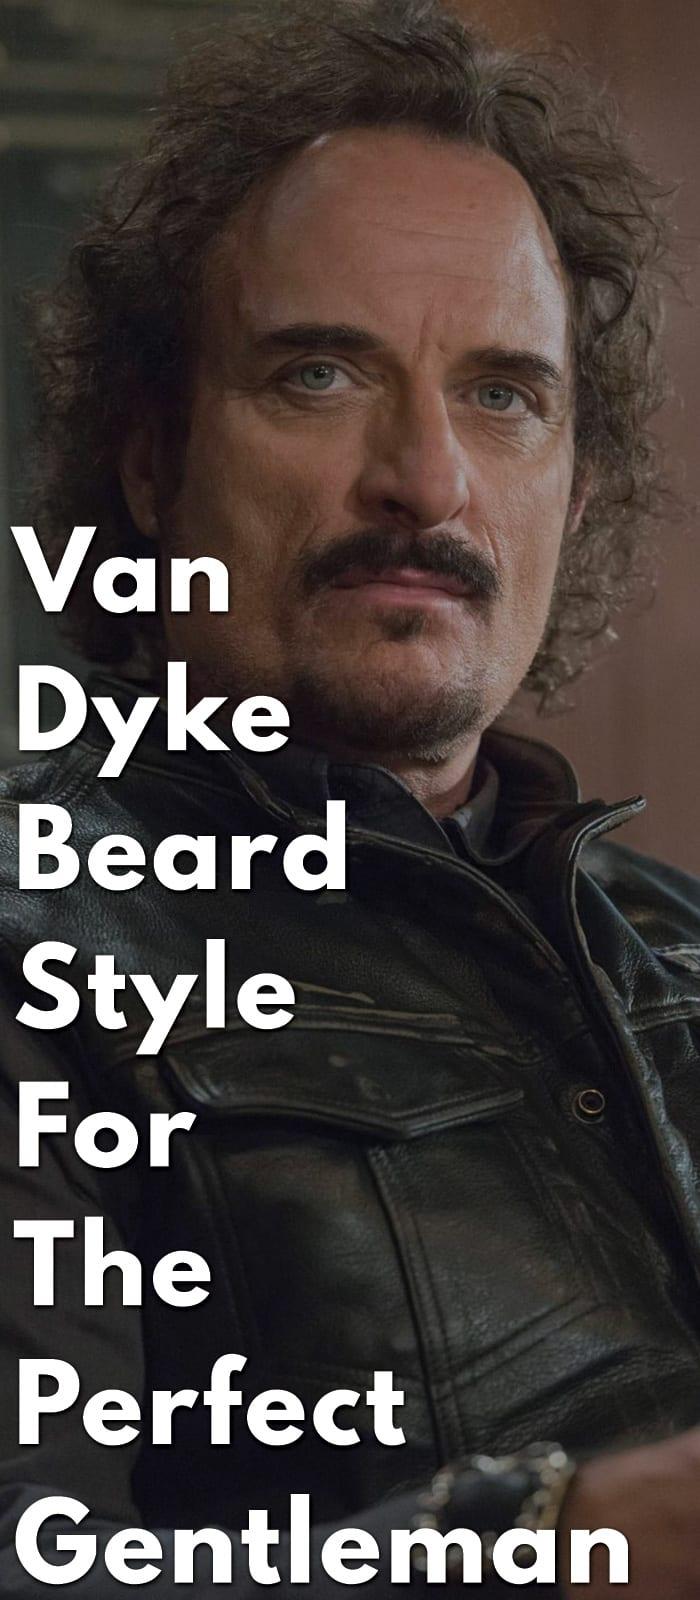 Van-Dyke-Beard-Style-–-The-Beard-Style-For-The-Perfect-Gentleman.